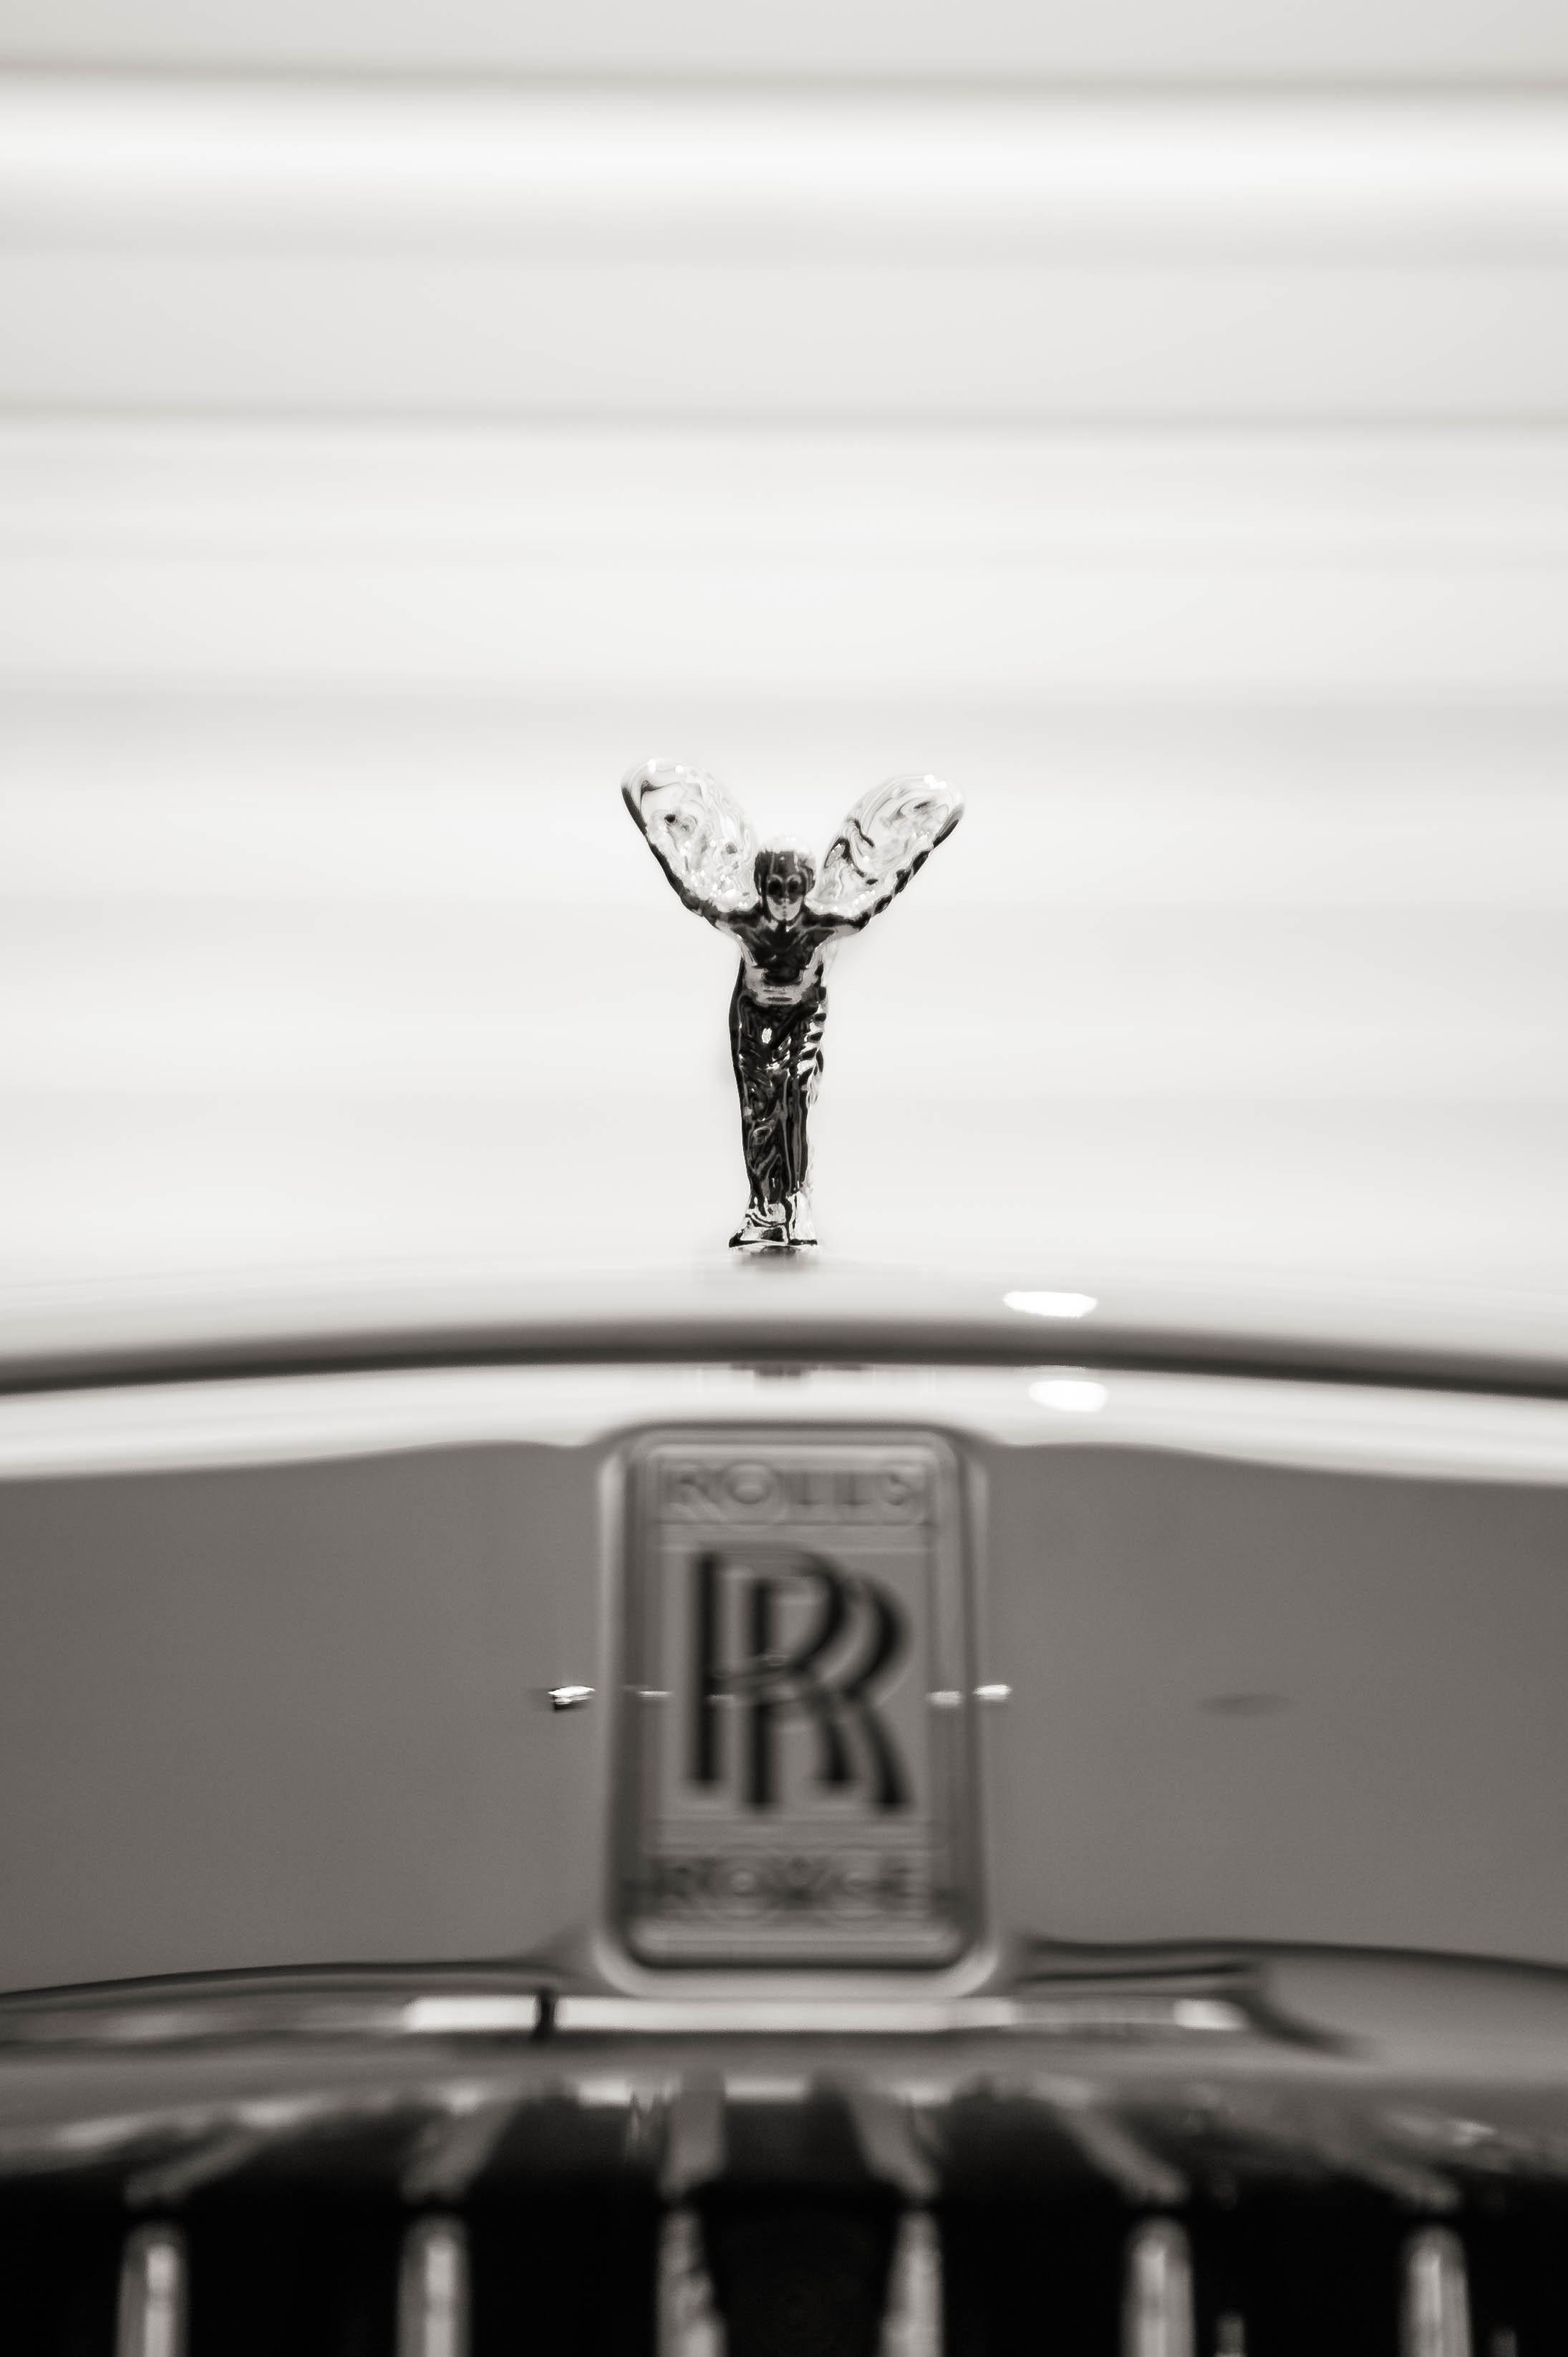 Chi tiet Rolls-Royce Cullinan chinh hang o VN anh 6